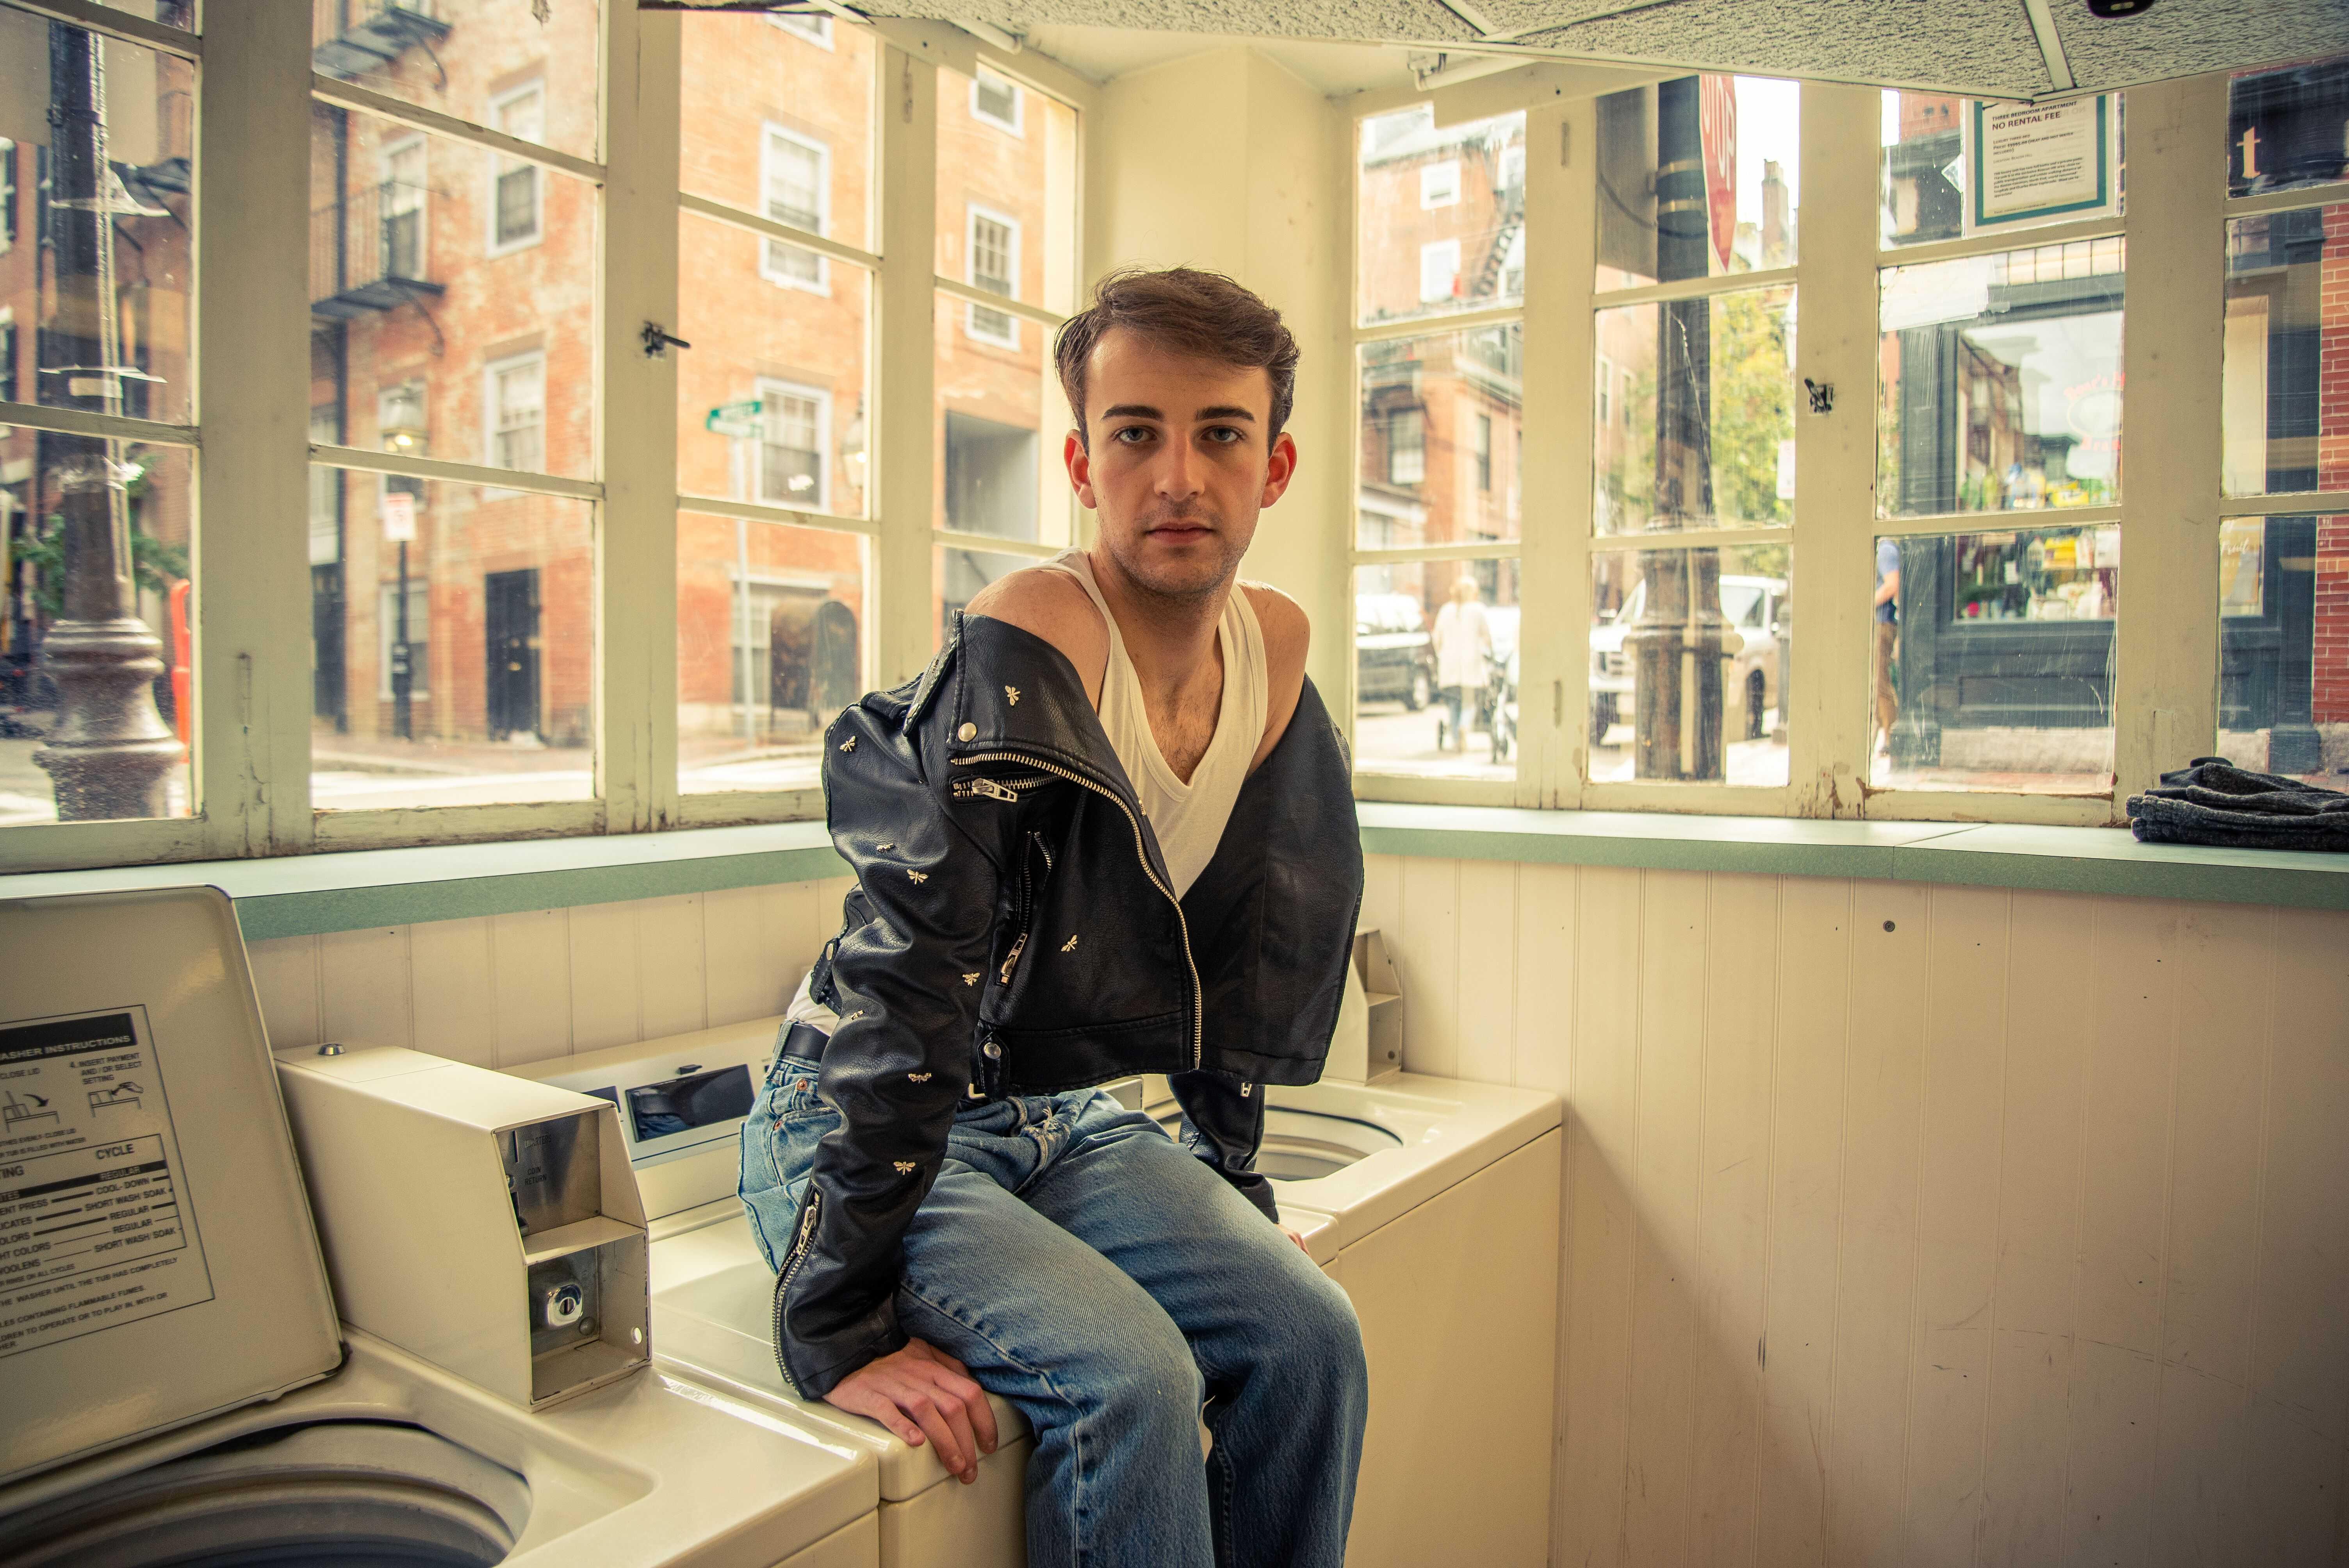 Junior Andrew Muccitelli sits atop a washing machine at Myrtle Street Laundromat. Jakob Menendez / Beacon Staff